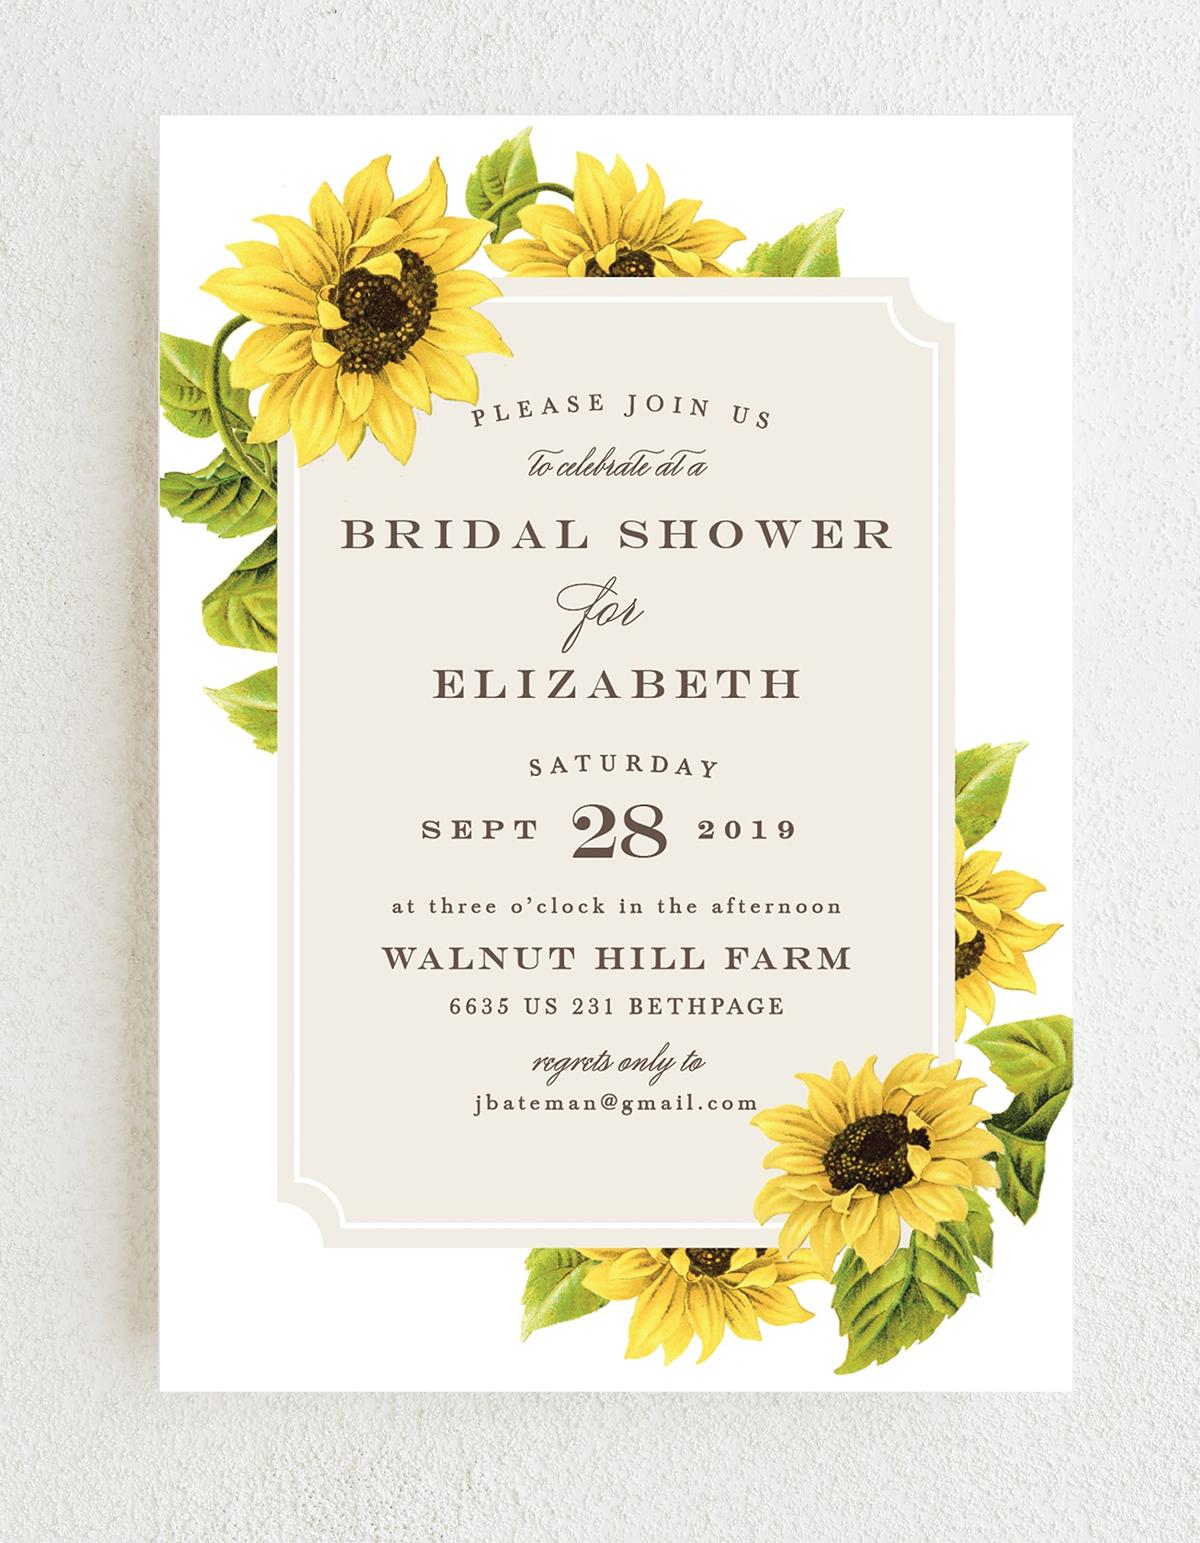 Sunflower Field Bridal Shower Invitations in 2020 Fall